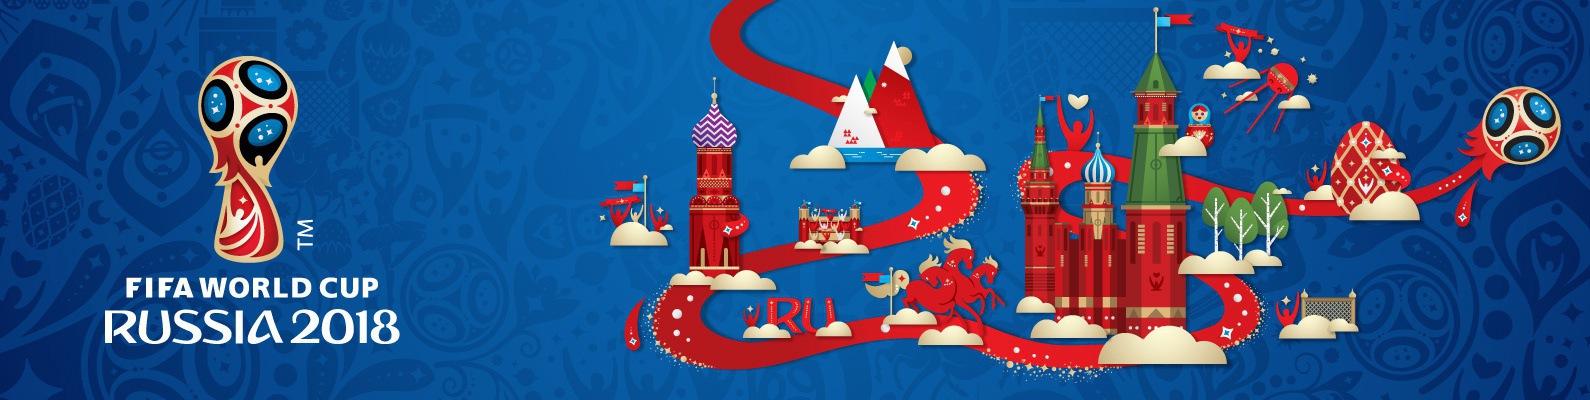 Чемпионат мира 2018 по футболу вакансии в москве